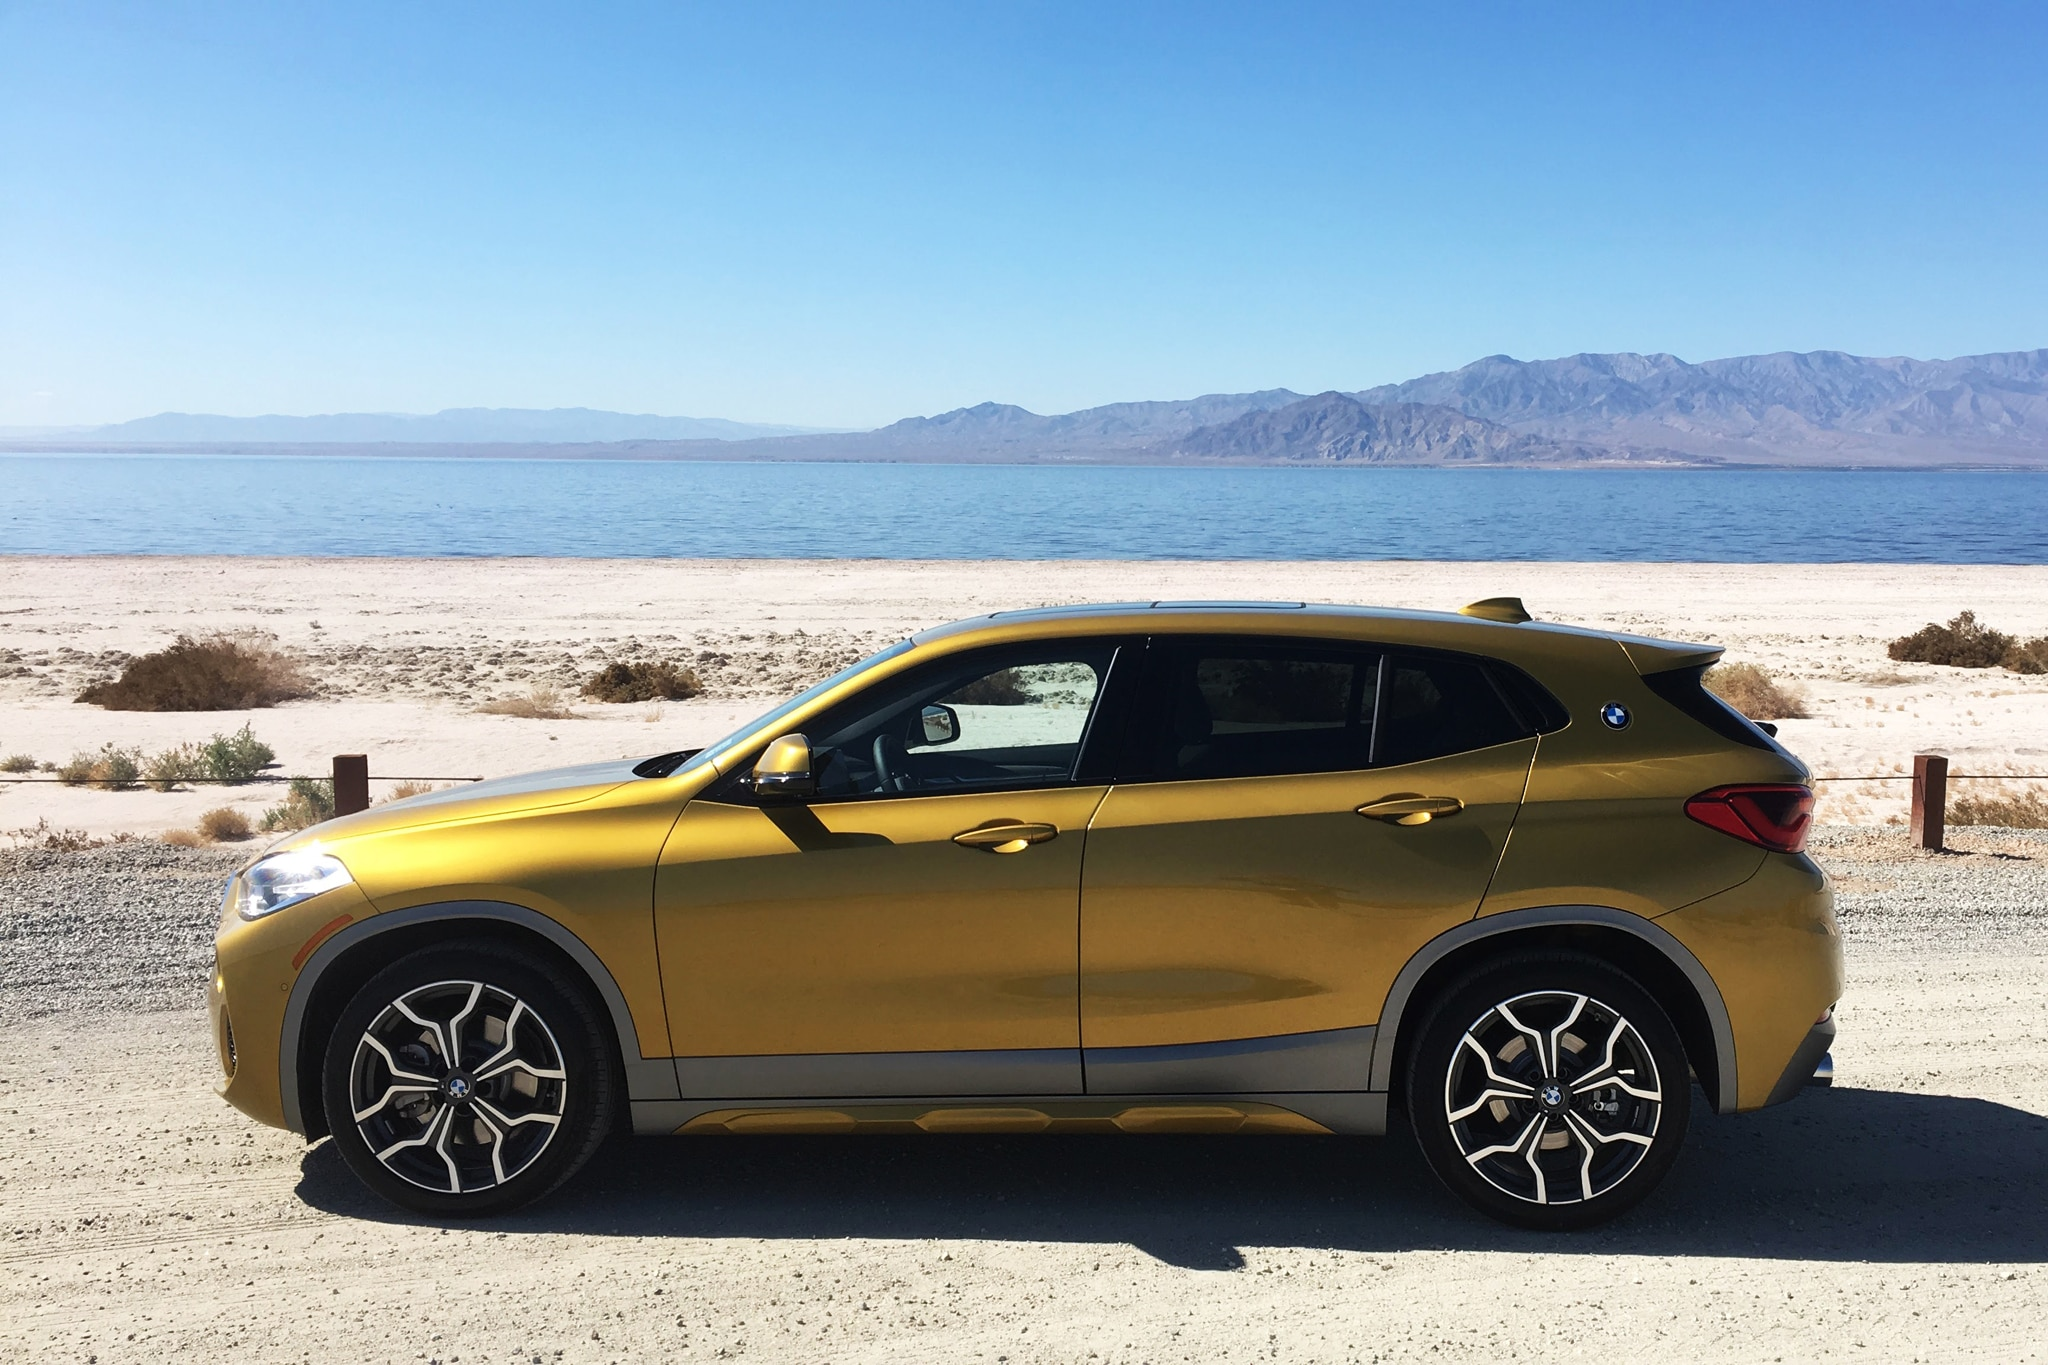 2018 BMW X2 XDrive 28i Left Side Salton Sea